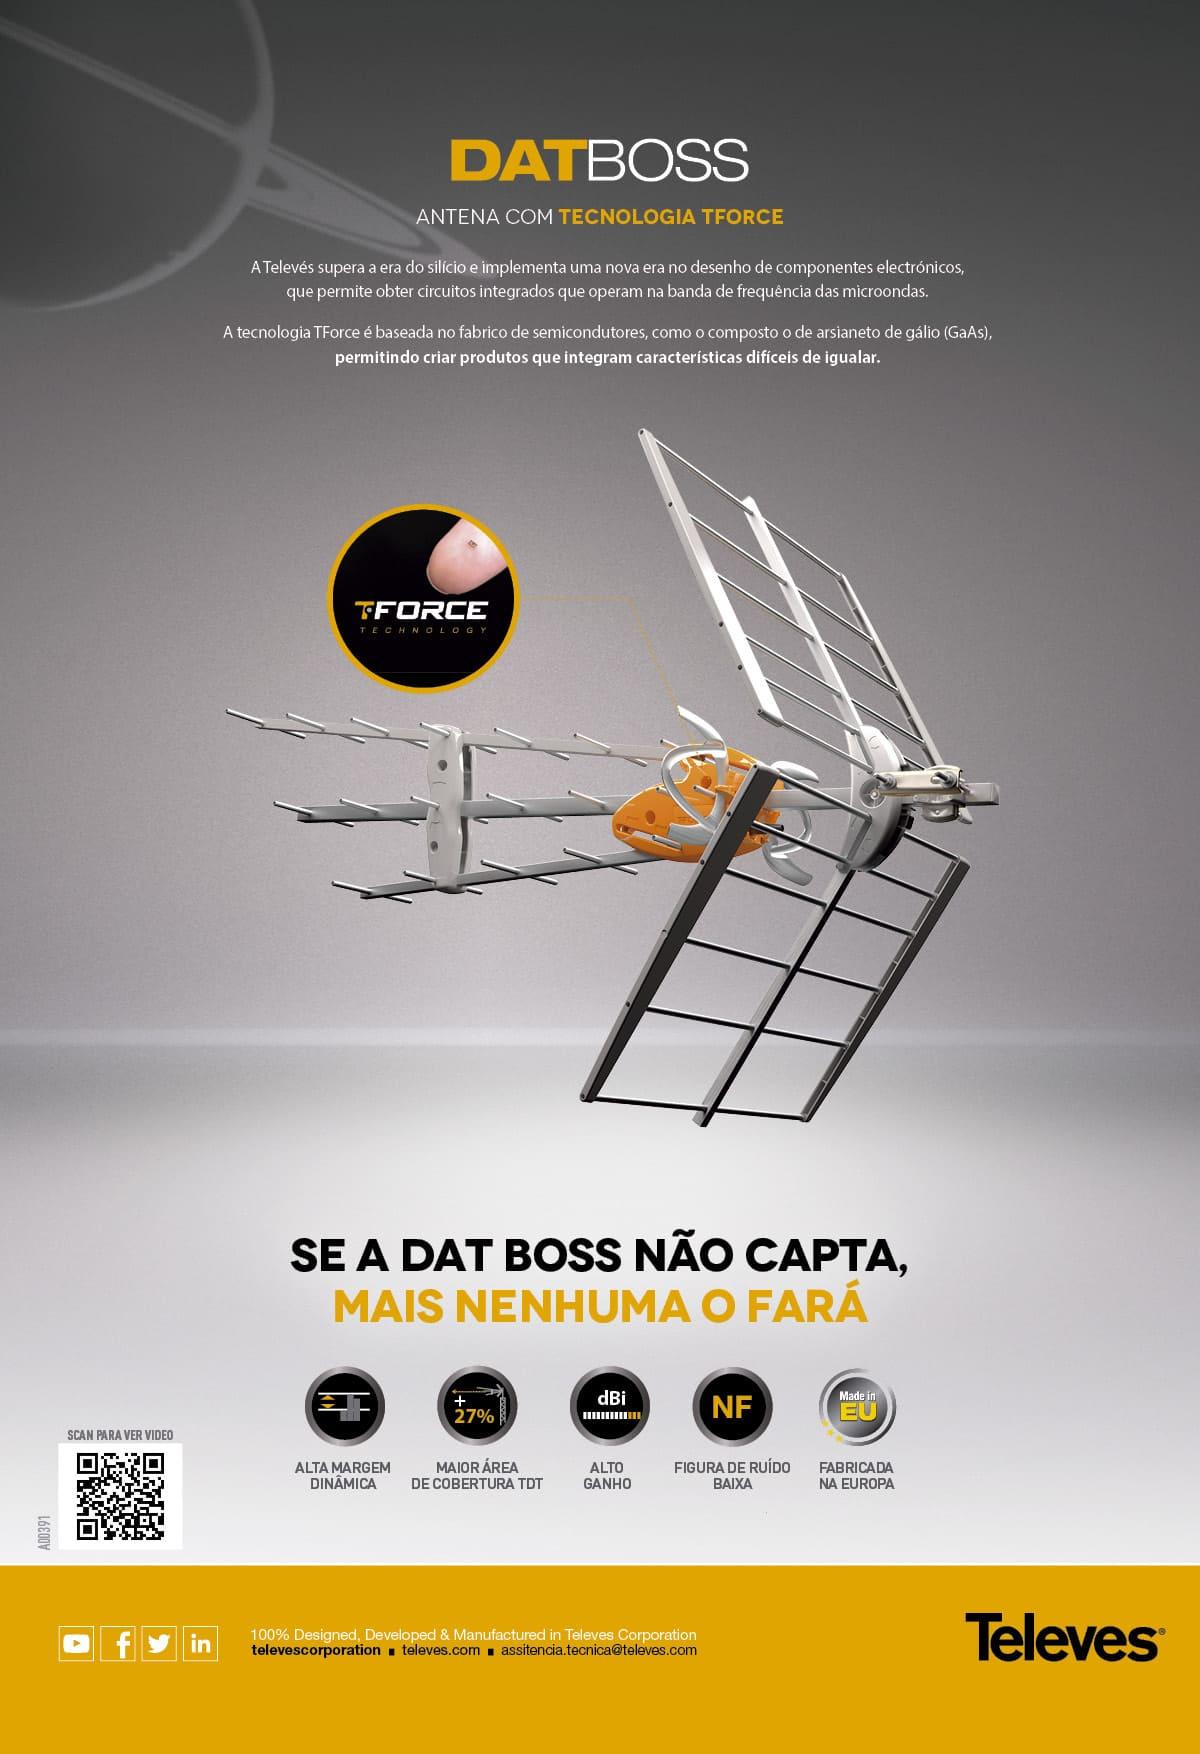 Antena DAT BOSS com tecnologia TForce